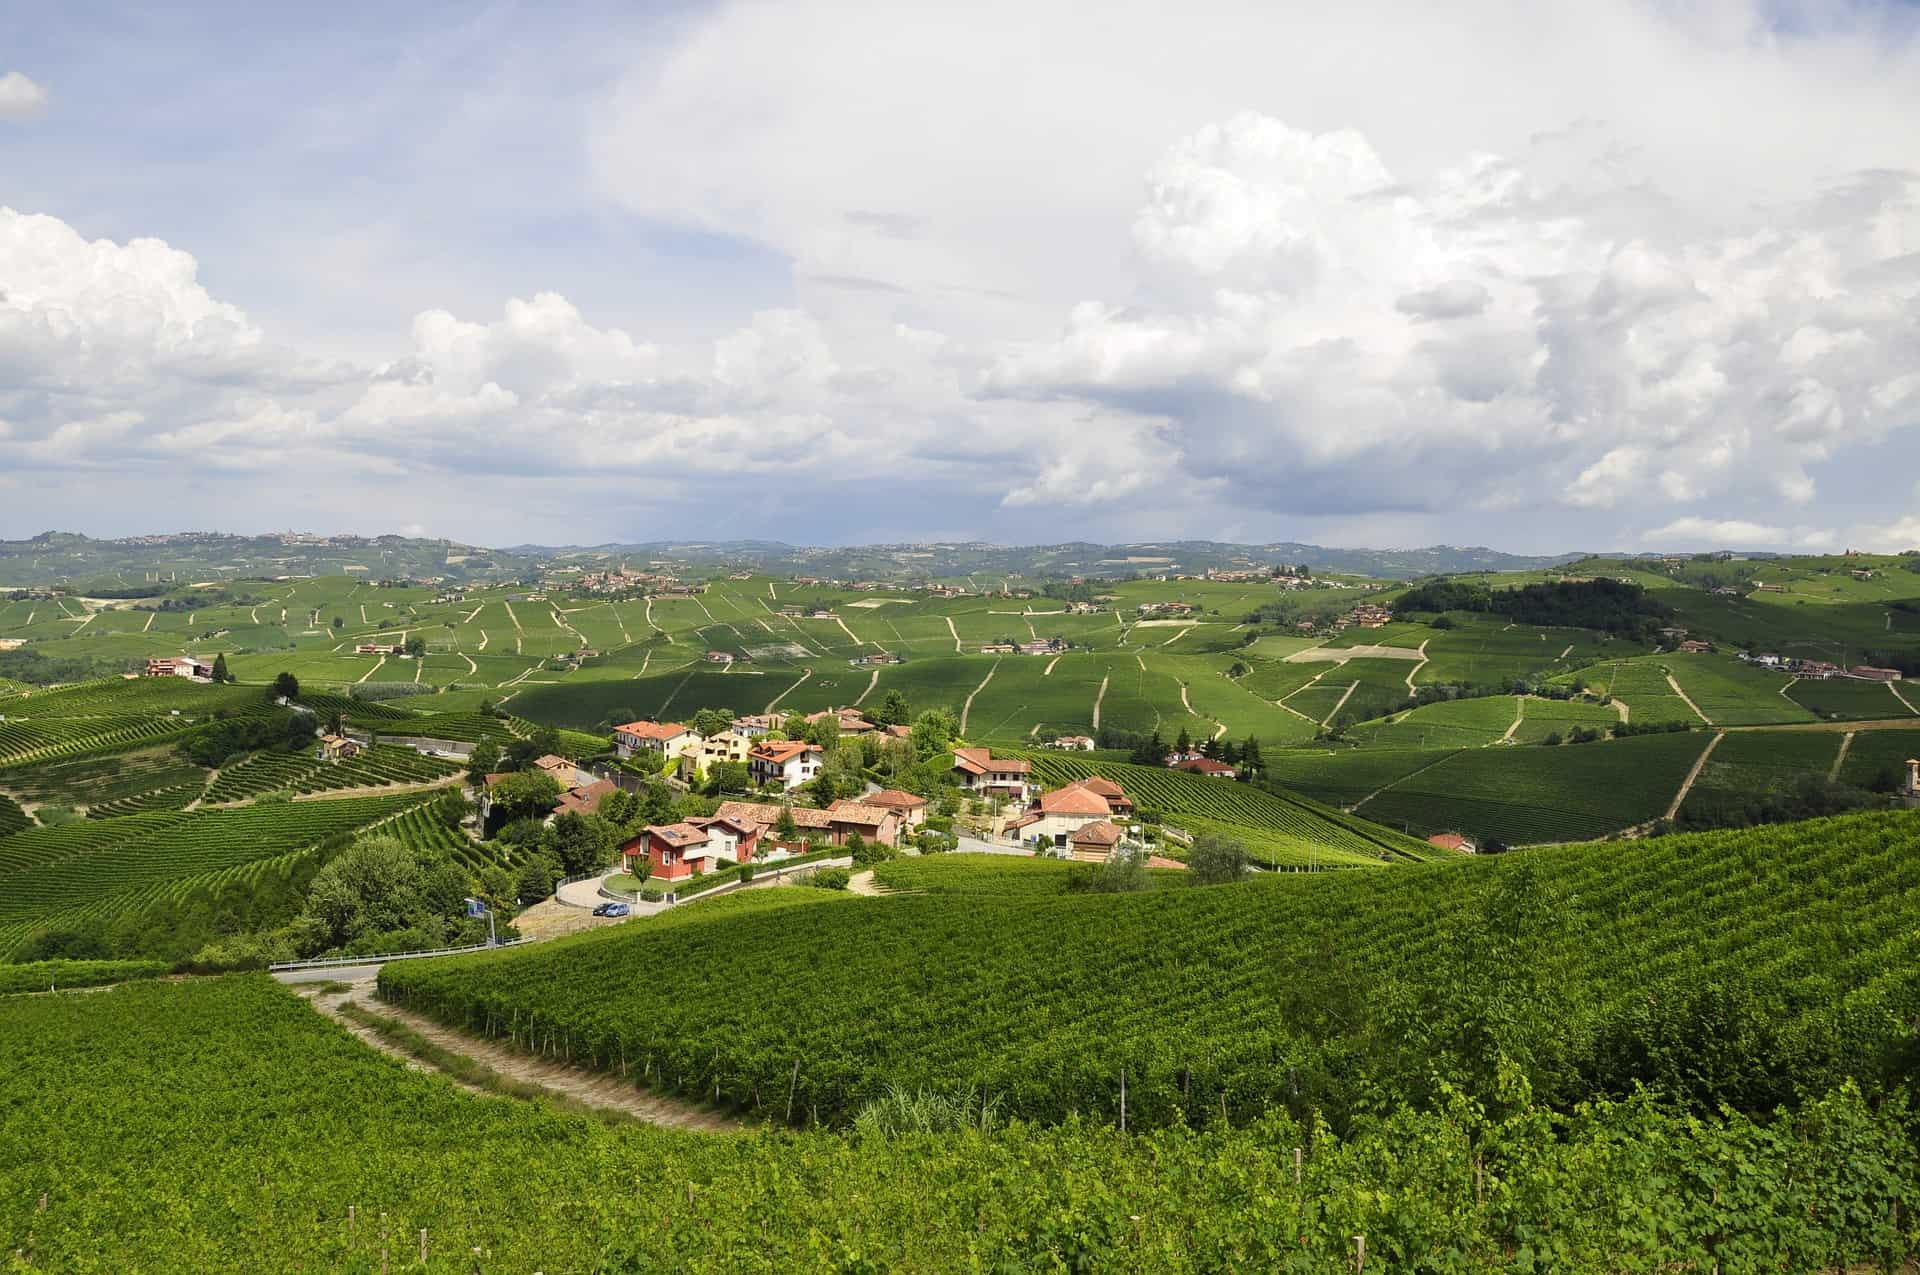 Hilltop view of Langhe wine region